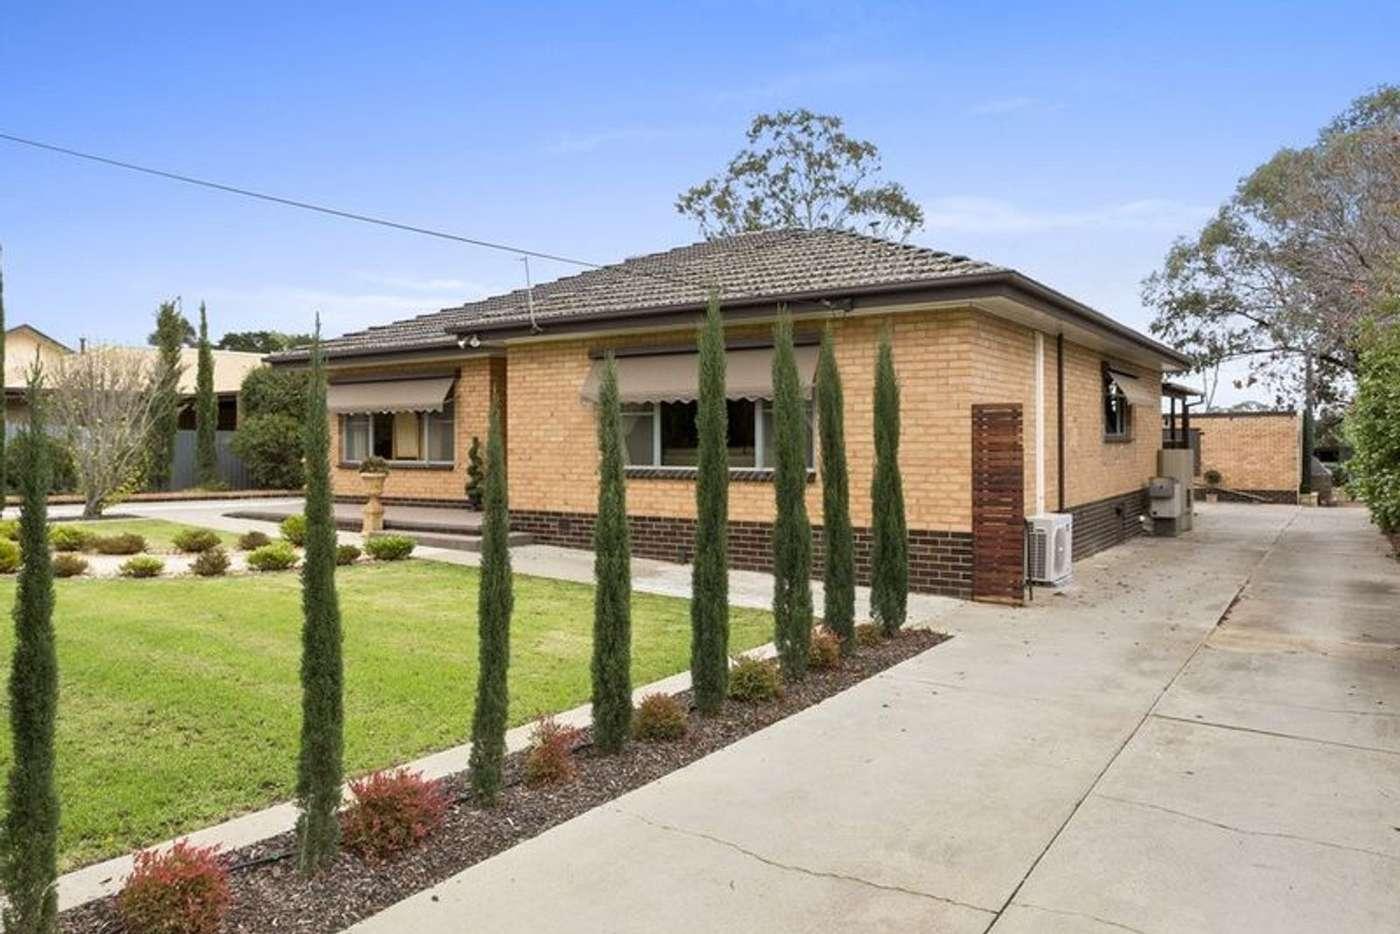 Main view of Homely house listing, 21 Lobb Street, North Bendigo VIC 3550